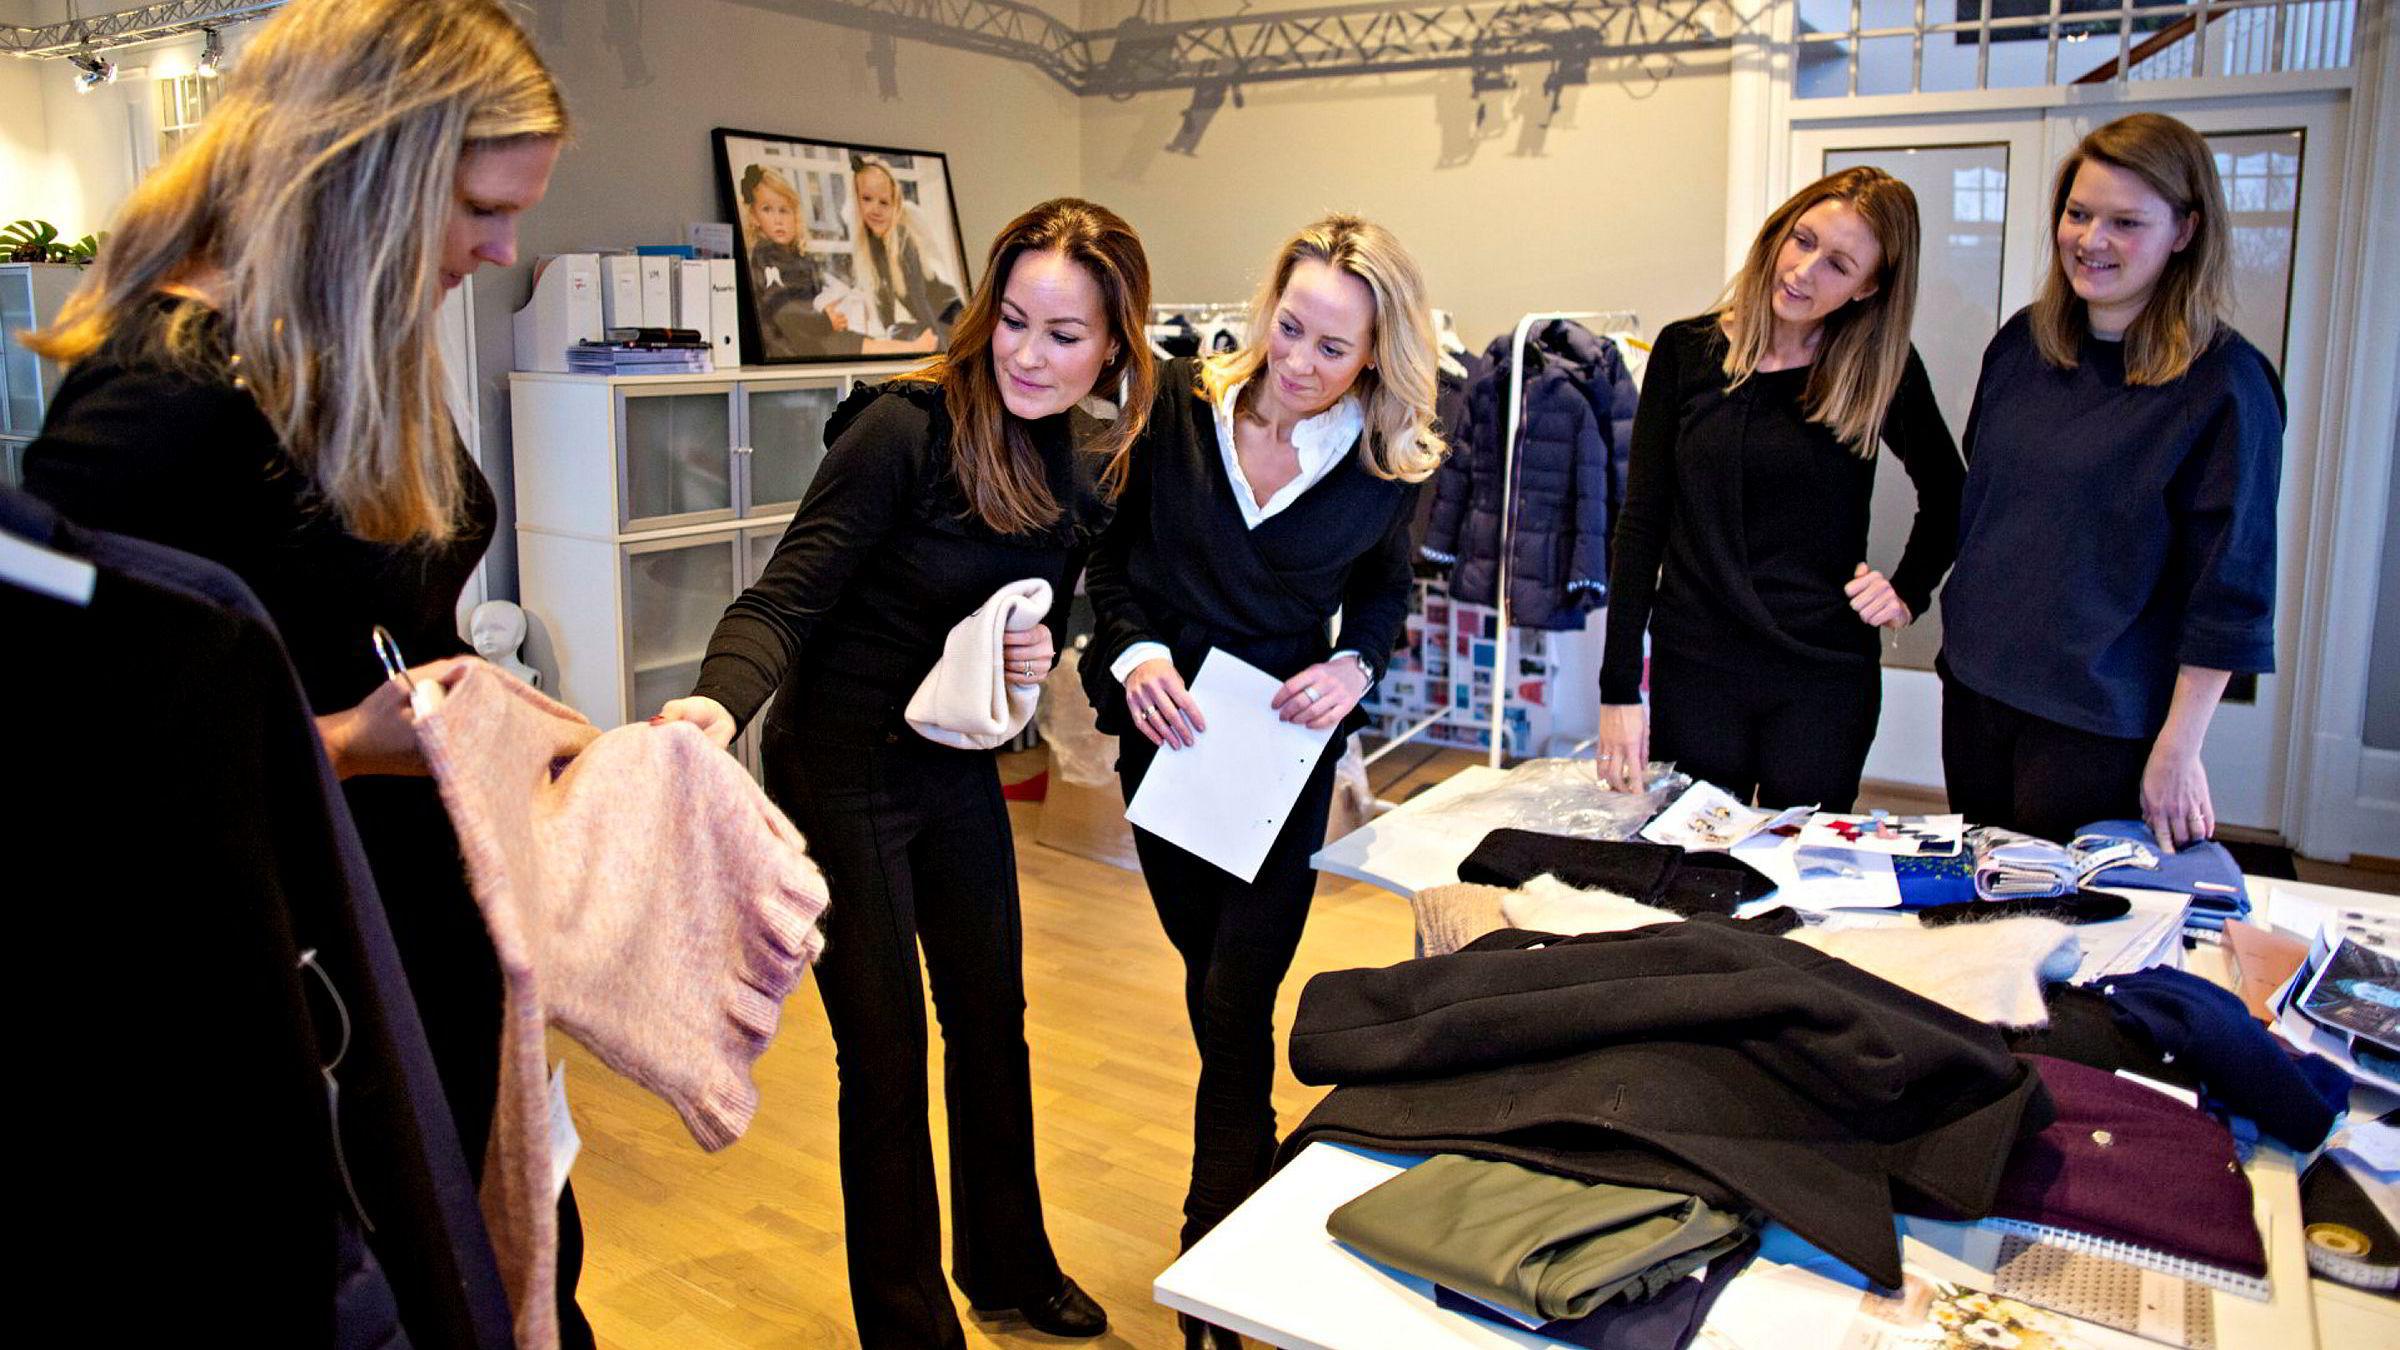 Anette Juel Knudtzon (til venstre) viser frem en ullgenser til Woolland-gründerne Hedda Rivelsrud, Annette Steen Lien og Siri Sørflaten. Designer Marie Enger helt til høyre.